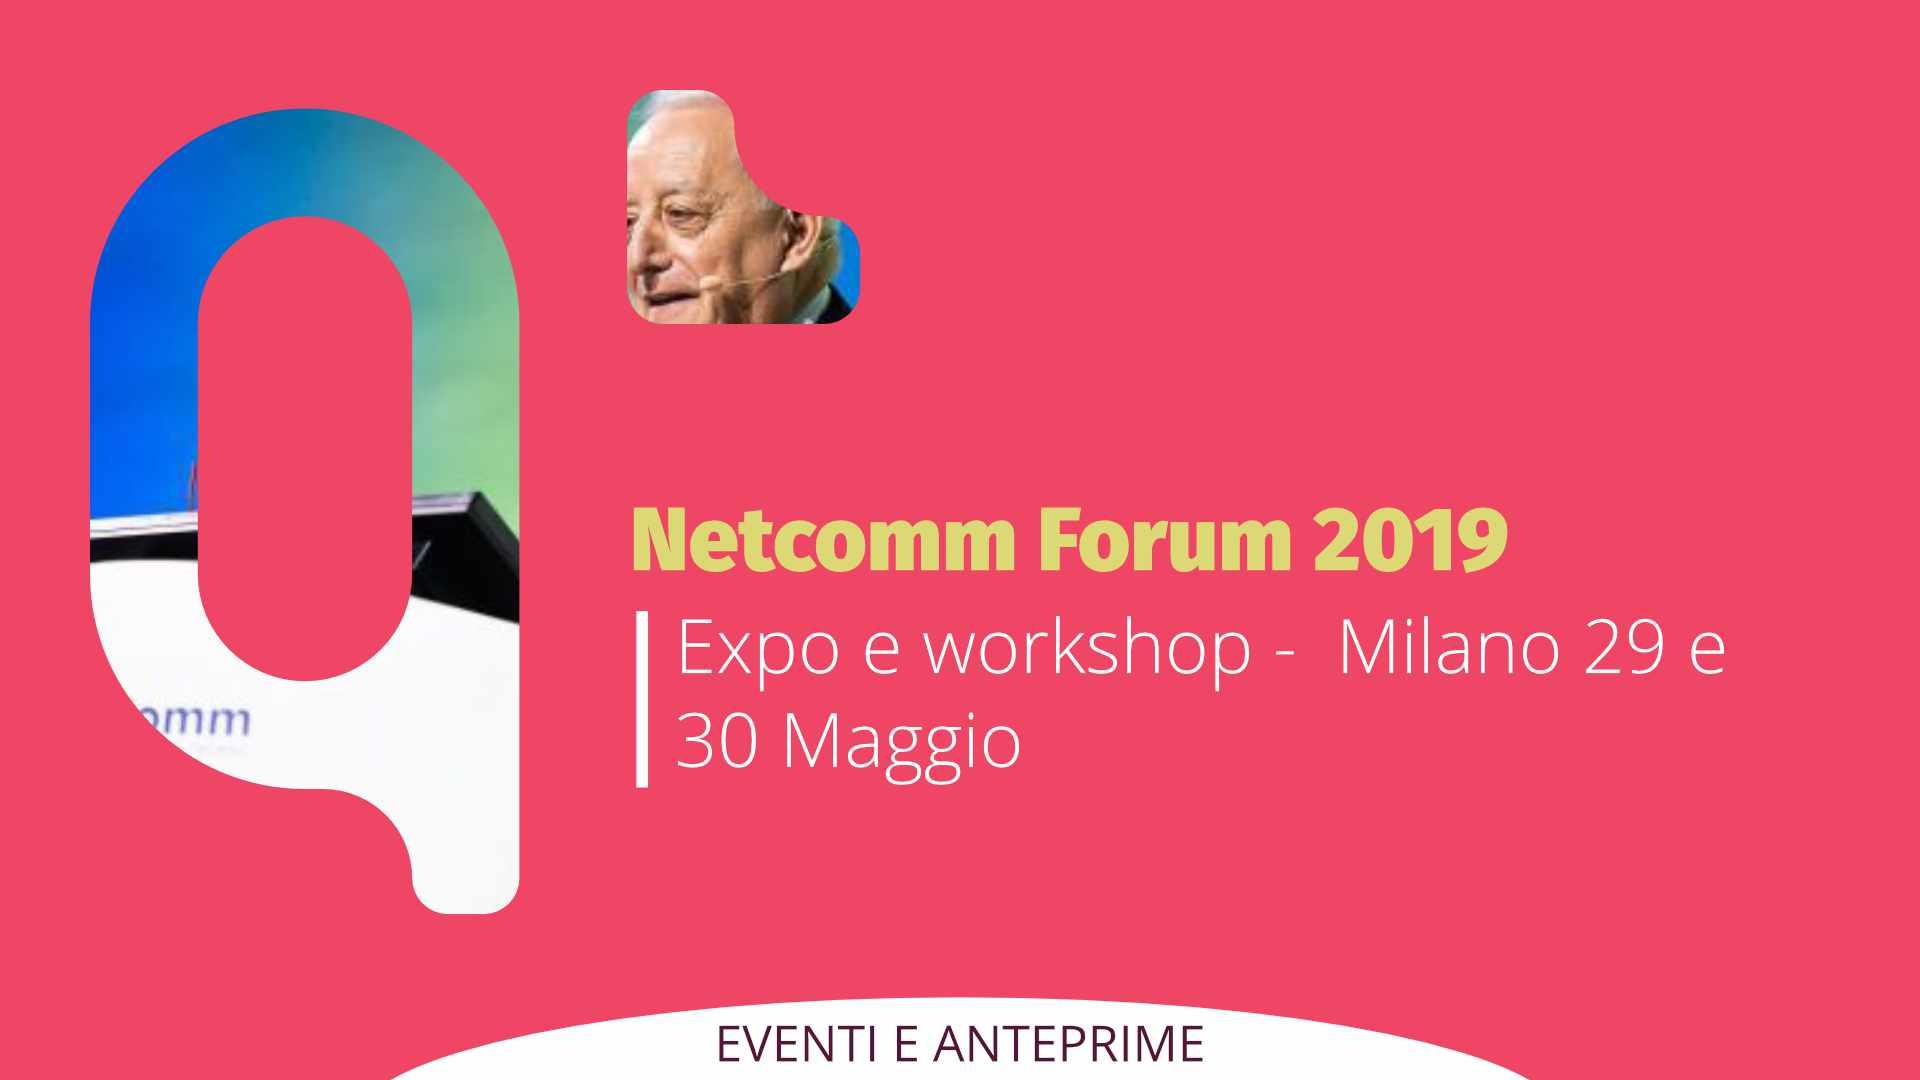 Qapla' a Netcomm Forum 2019: expo e workshop